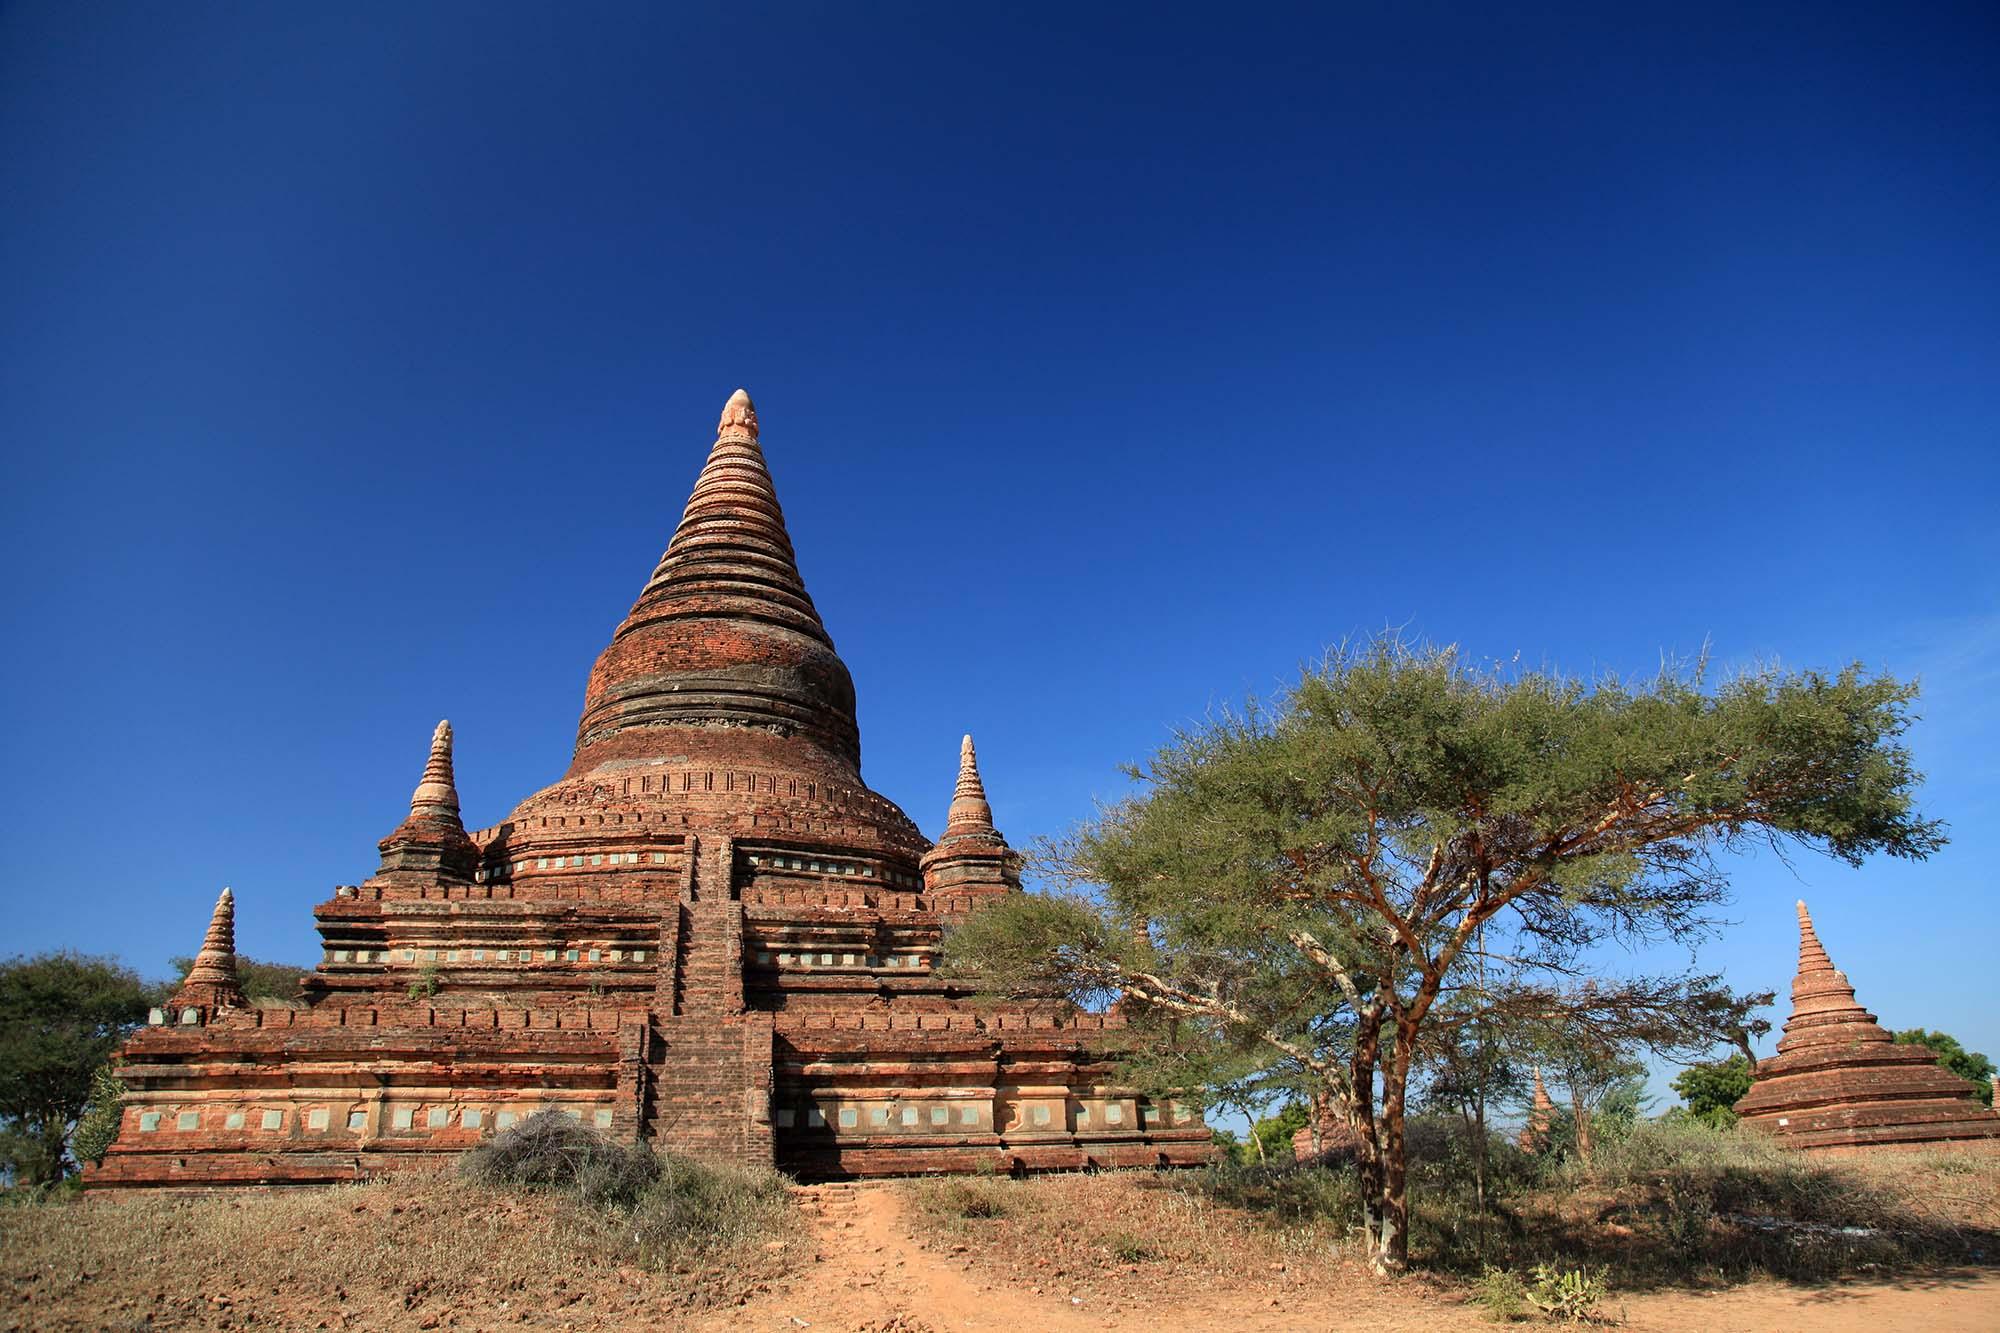 Visite de la plaine de Bagan en Birmanie avec Samsara Voyages